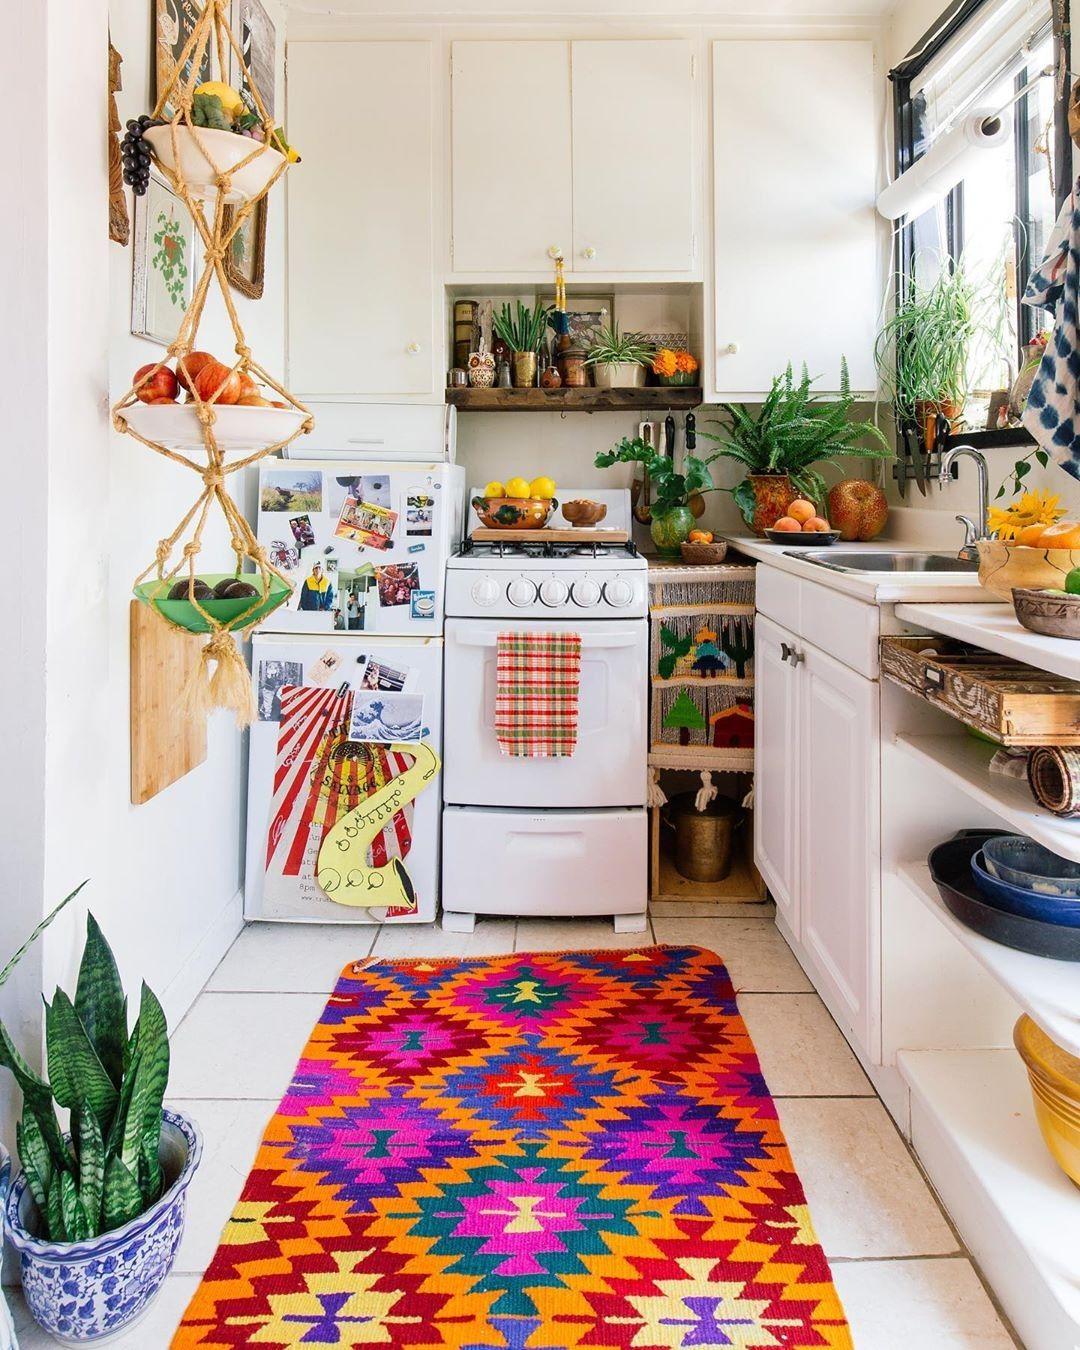 modern bohemian kitchen designs interieur ideeën design interieur on kitchen interior boho id=68198